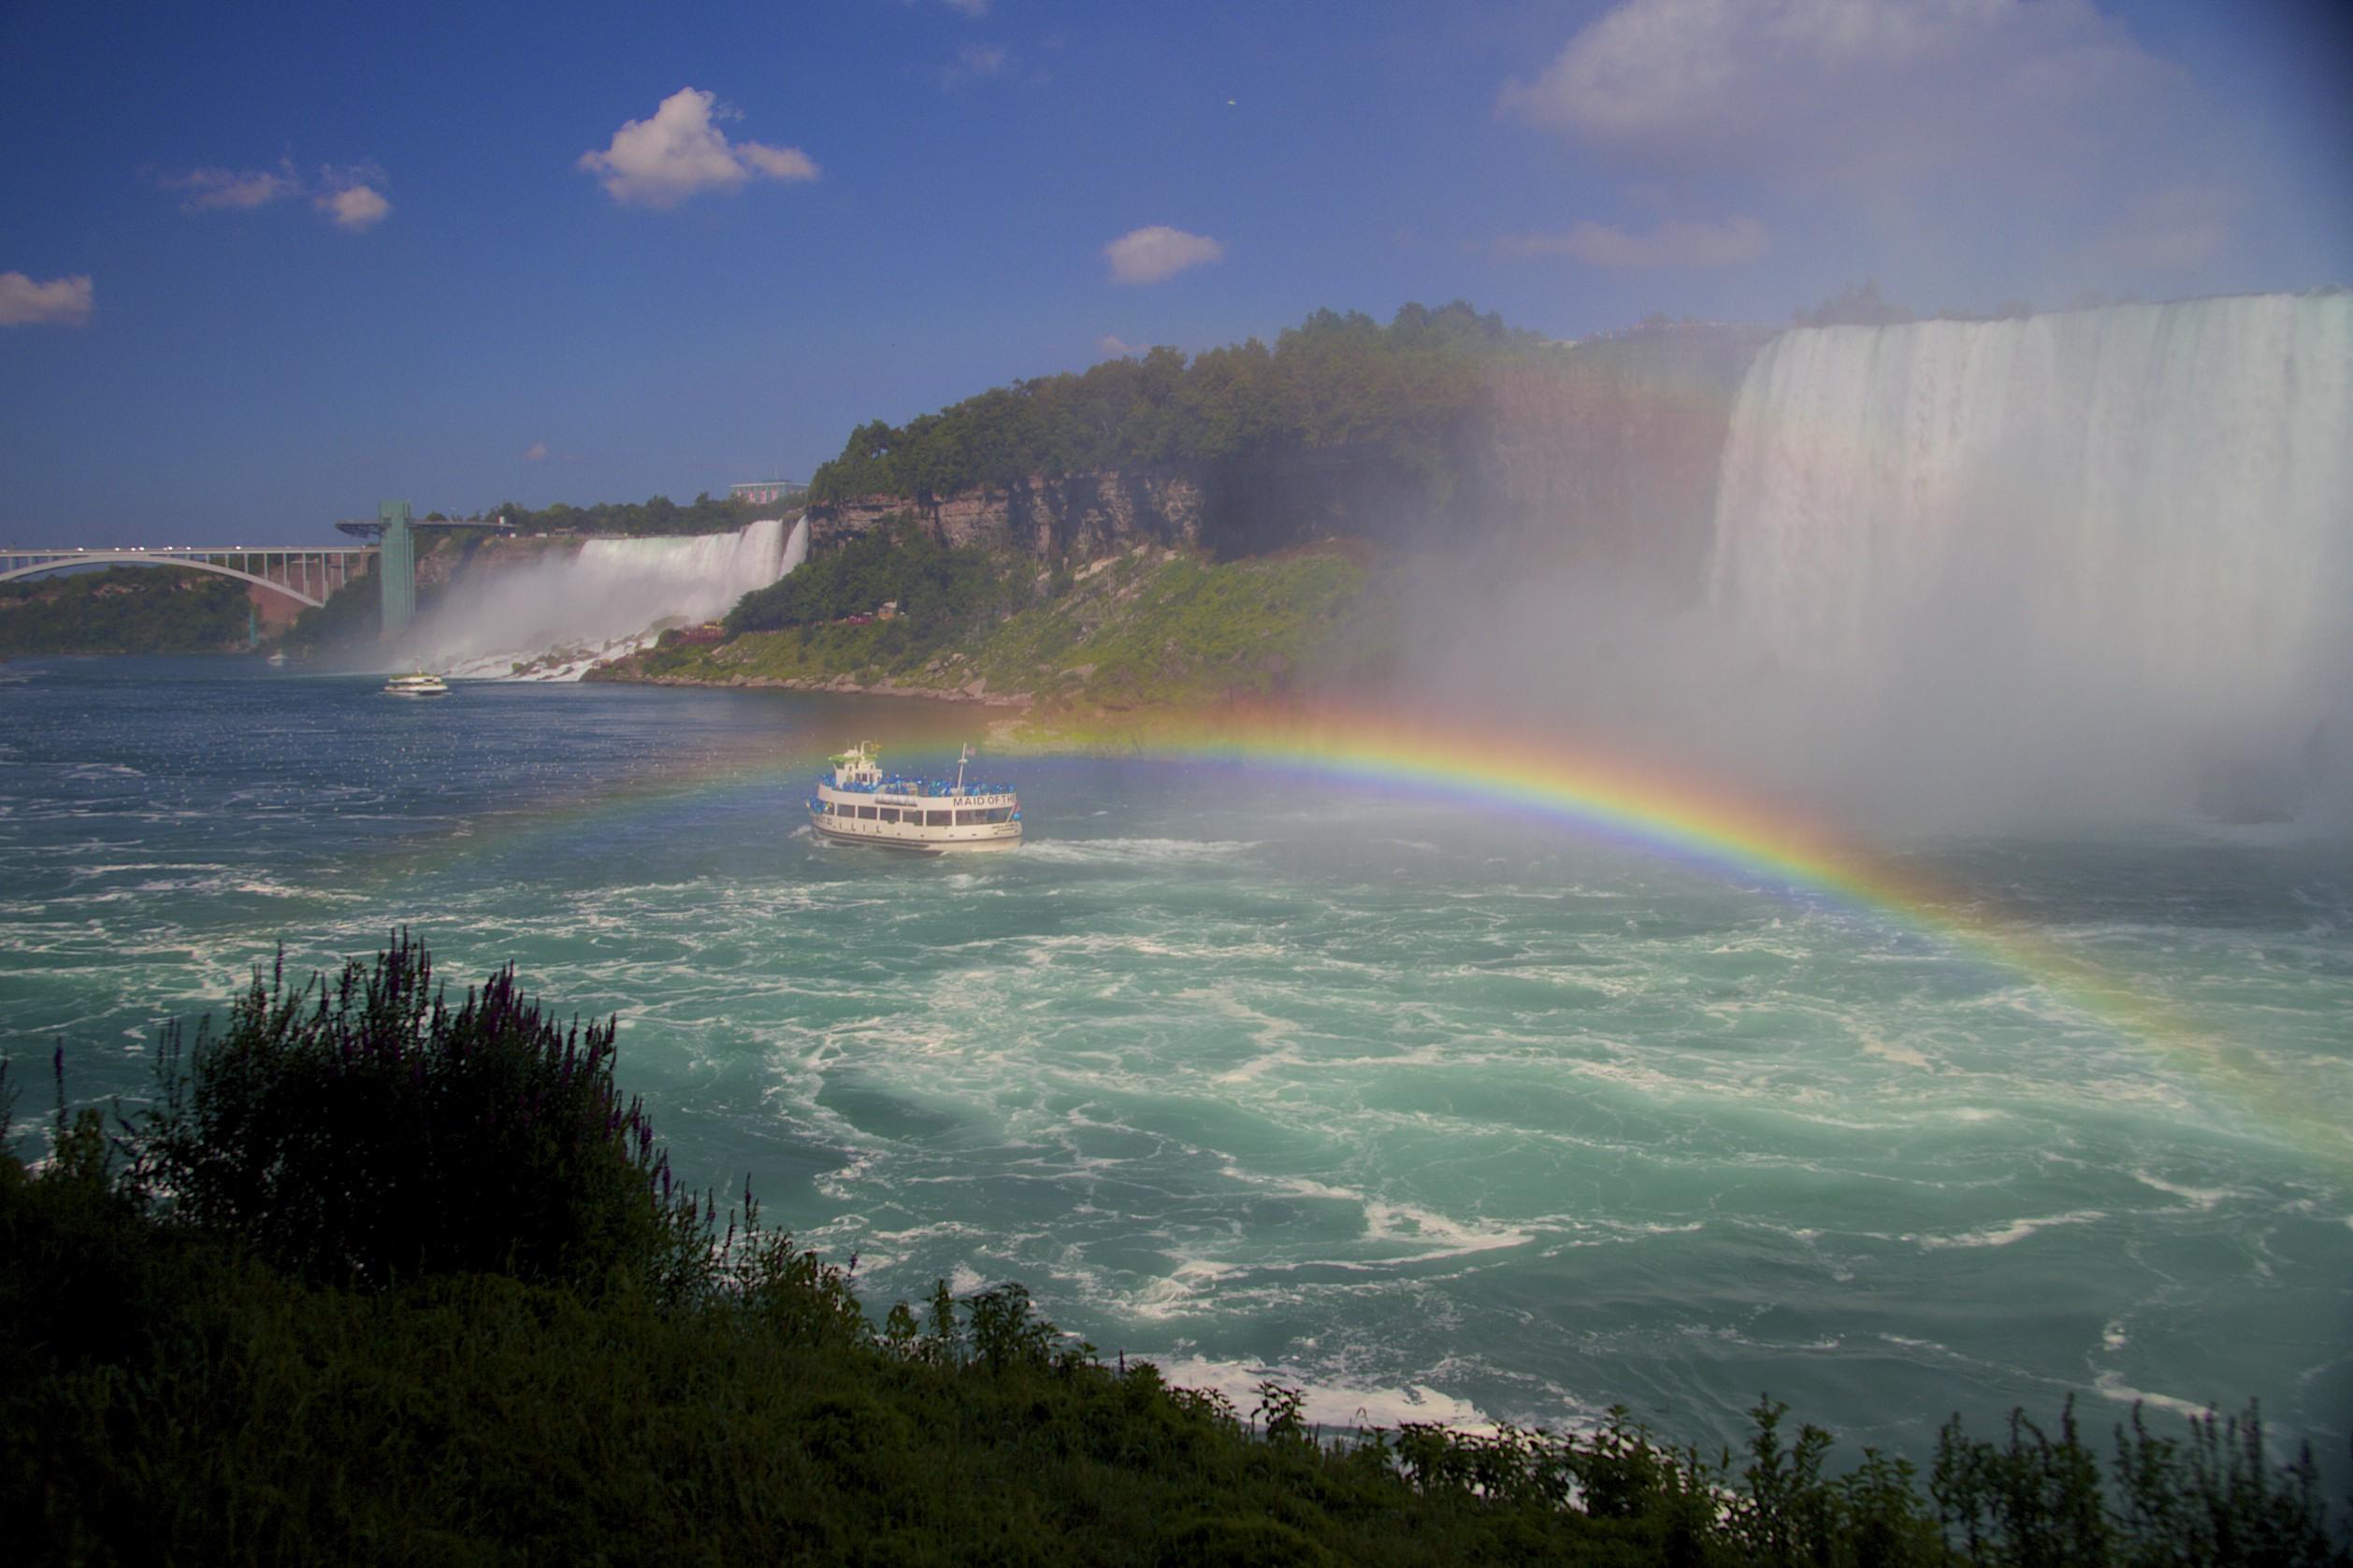 Rainbow over Maid of the Mist